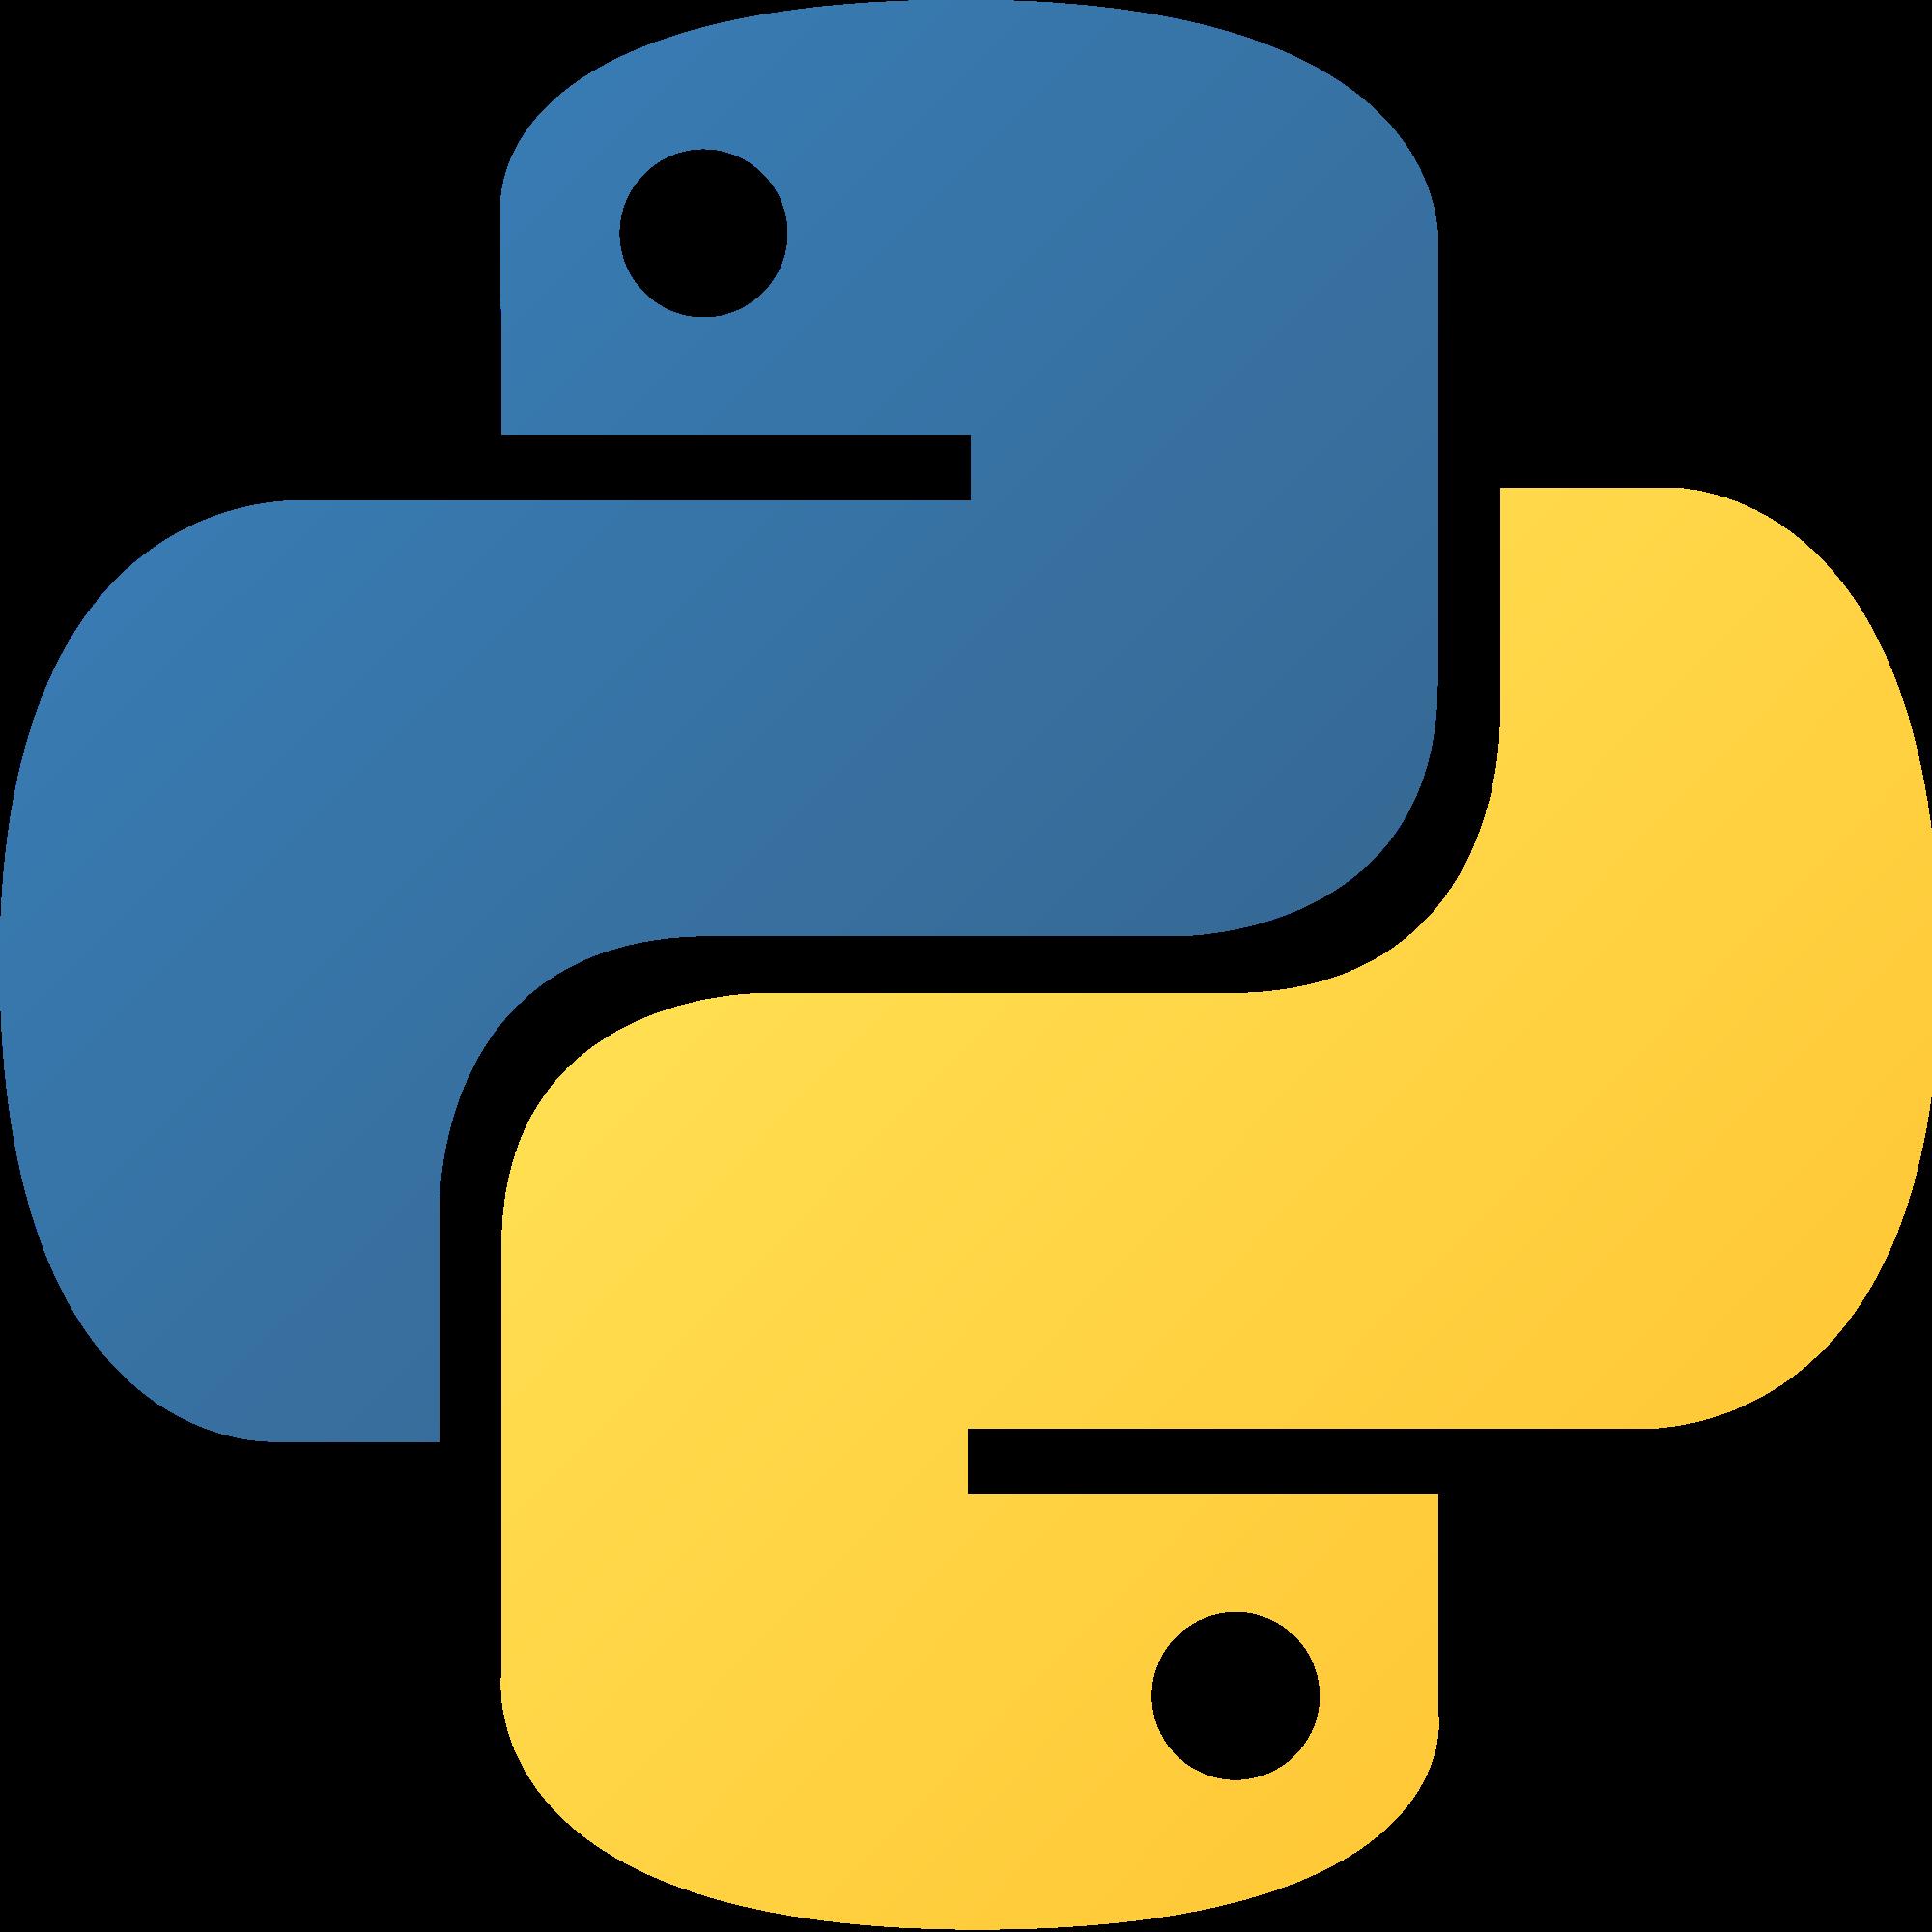 bundesliga_tippspiel/static/python-logo.png